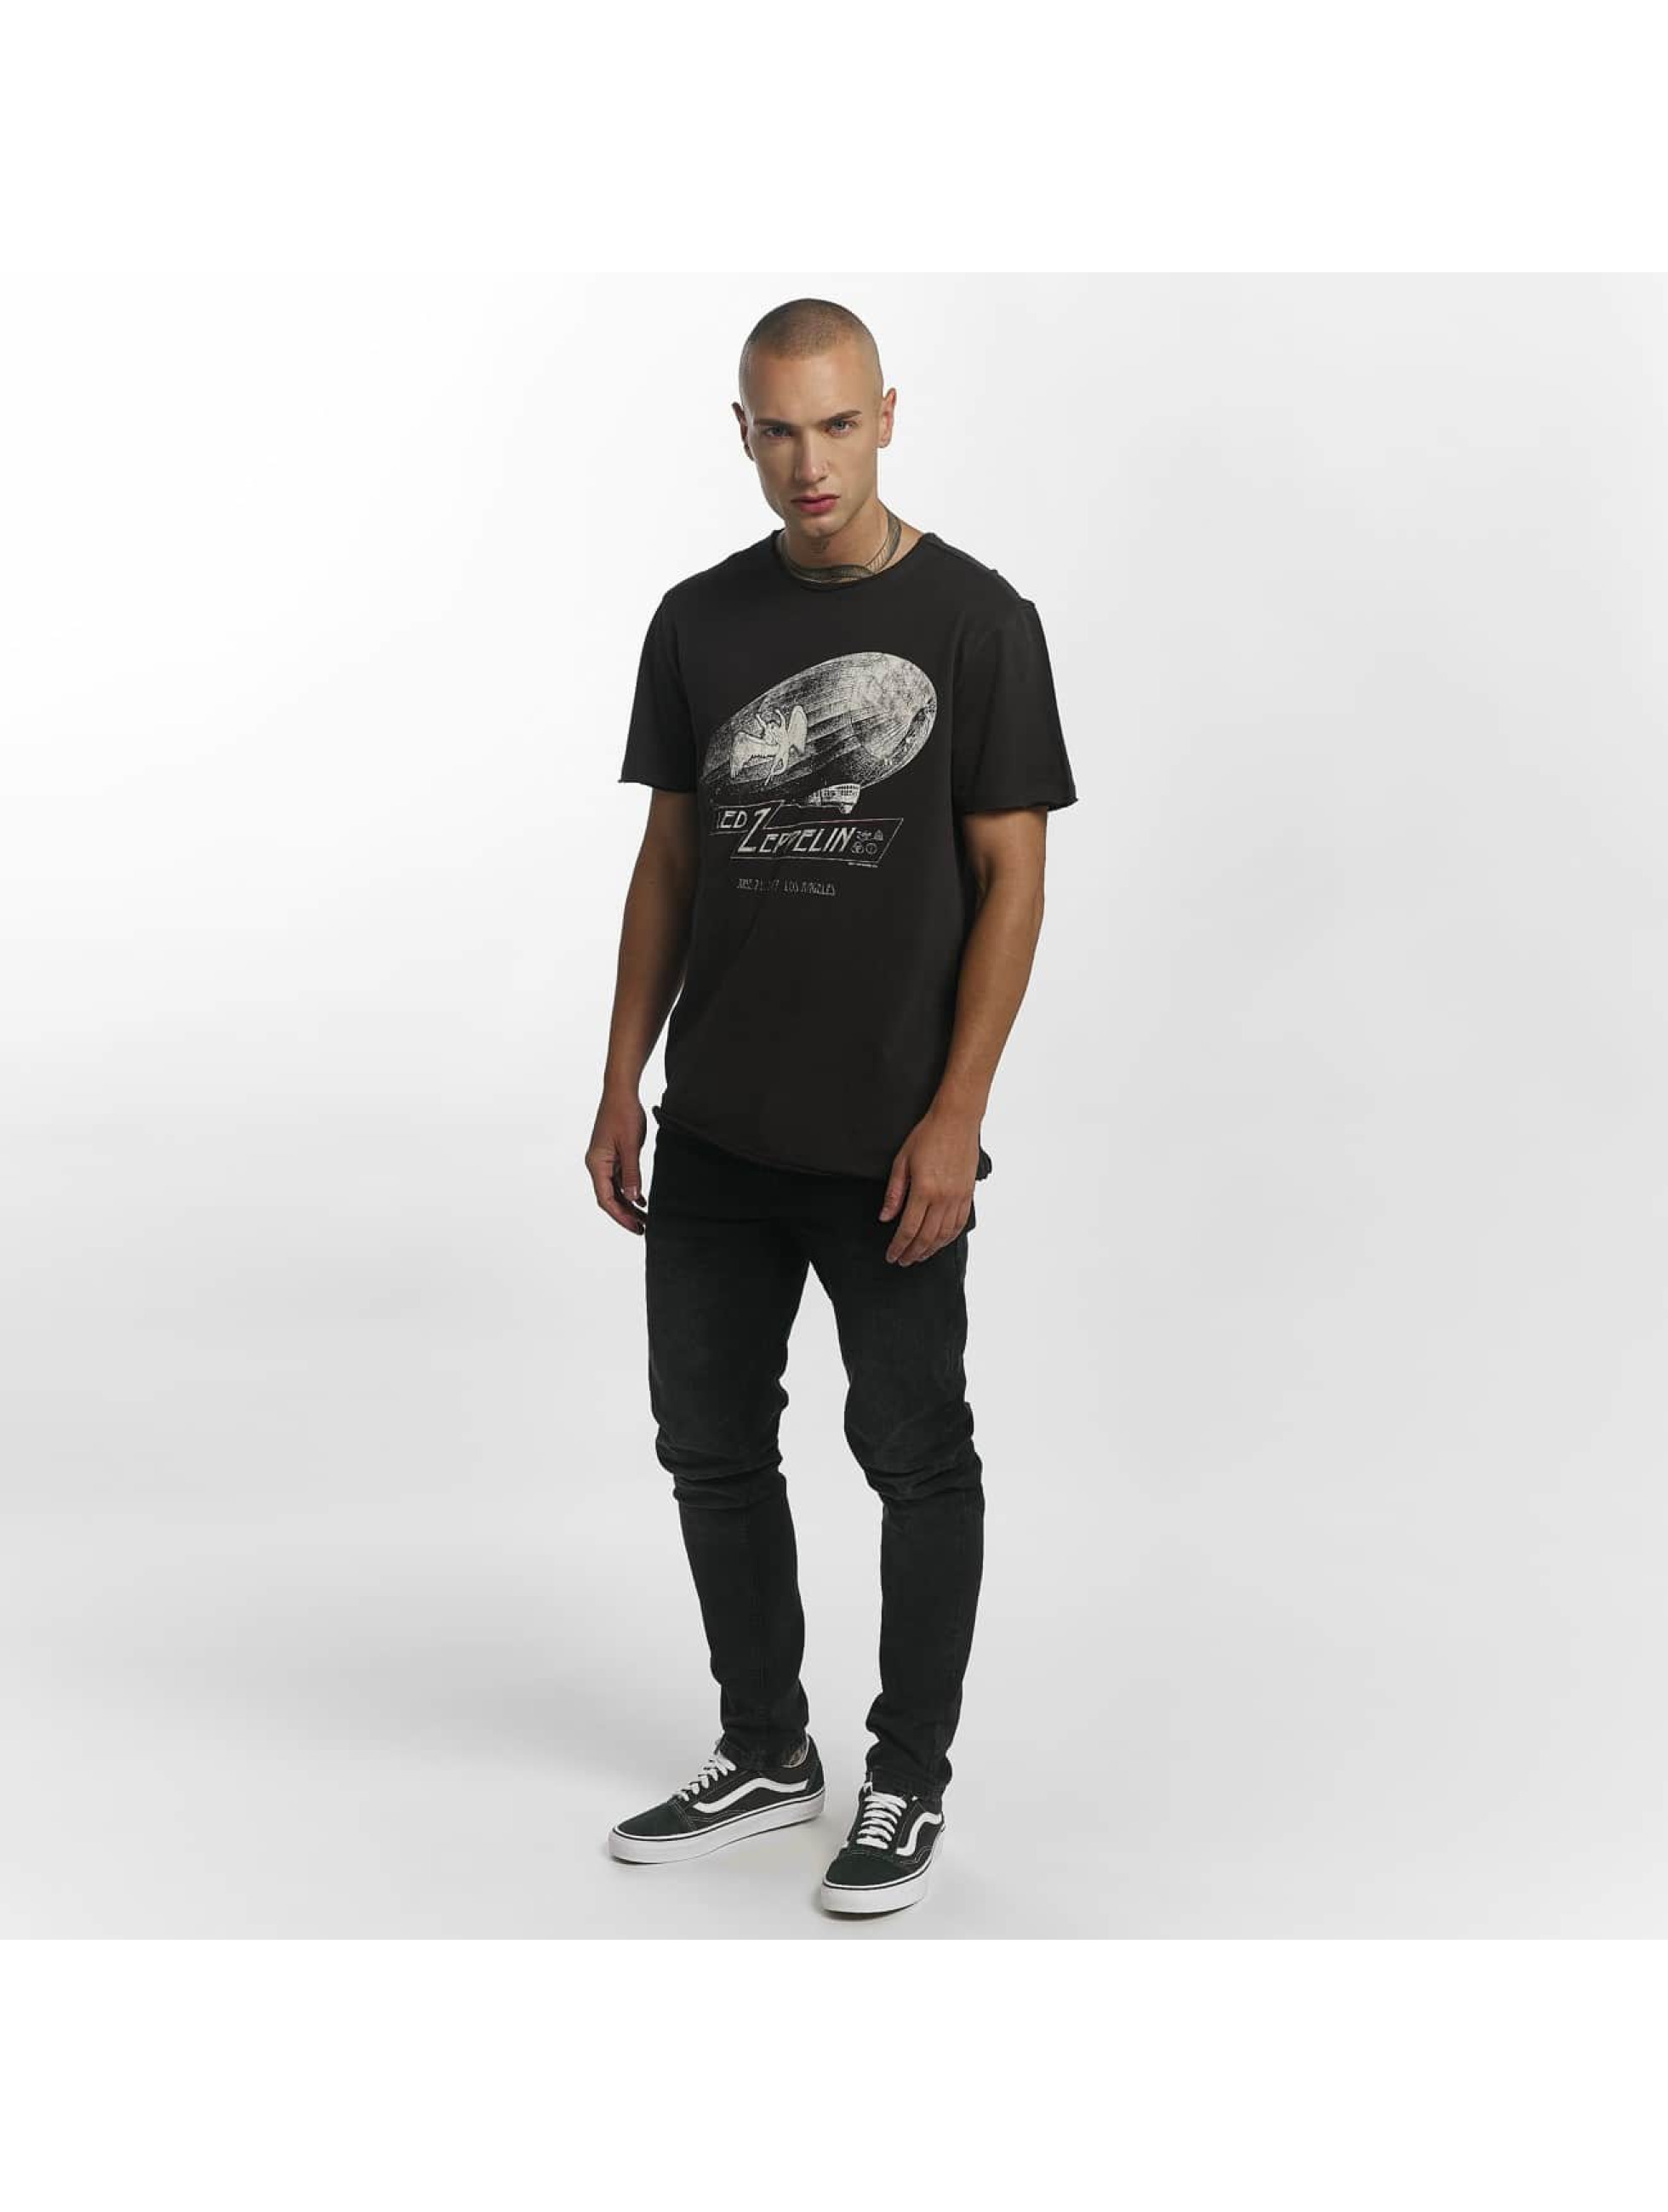 Amplified T-Shirt Led Zeppelin Dazed 6 Confused grau